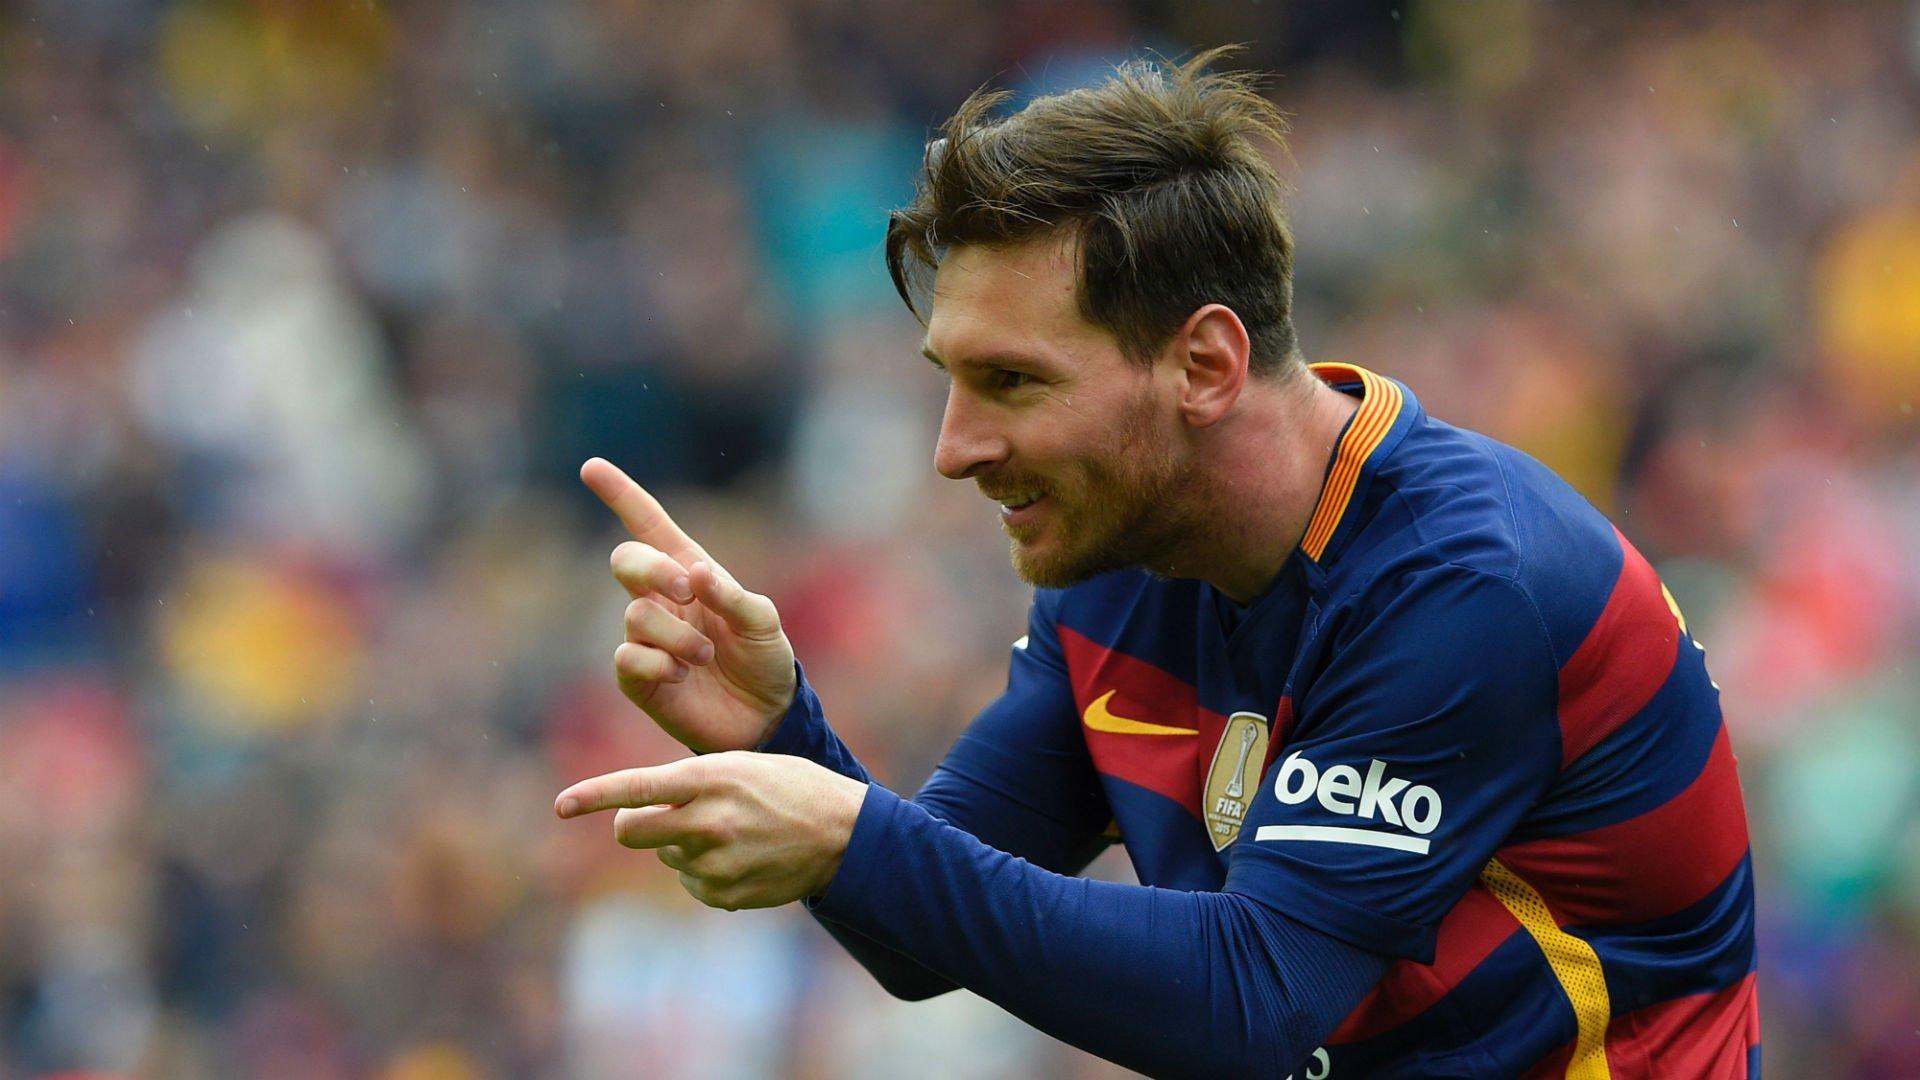 Ставки на футбол на Реал Сосьедад — Атлетик Б. Ставки на чемпионат Испании 28 Апреля 2018